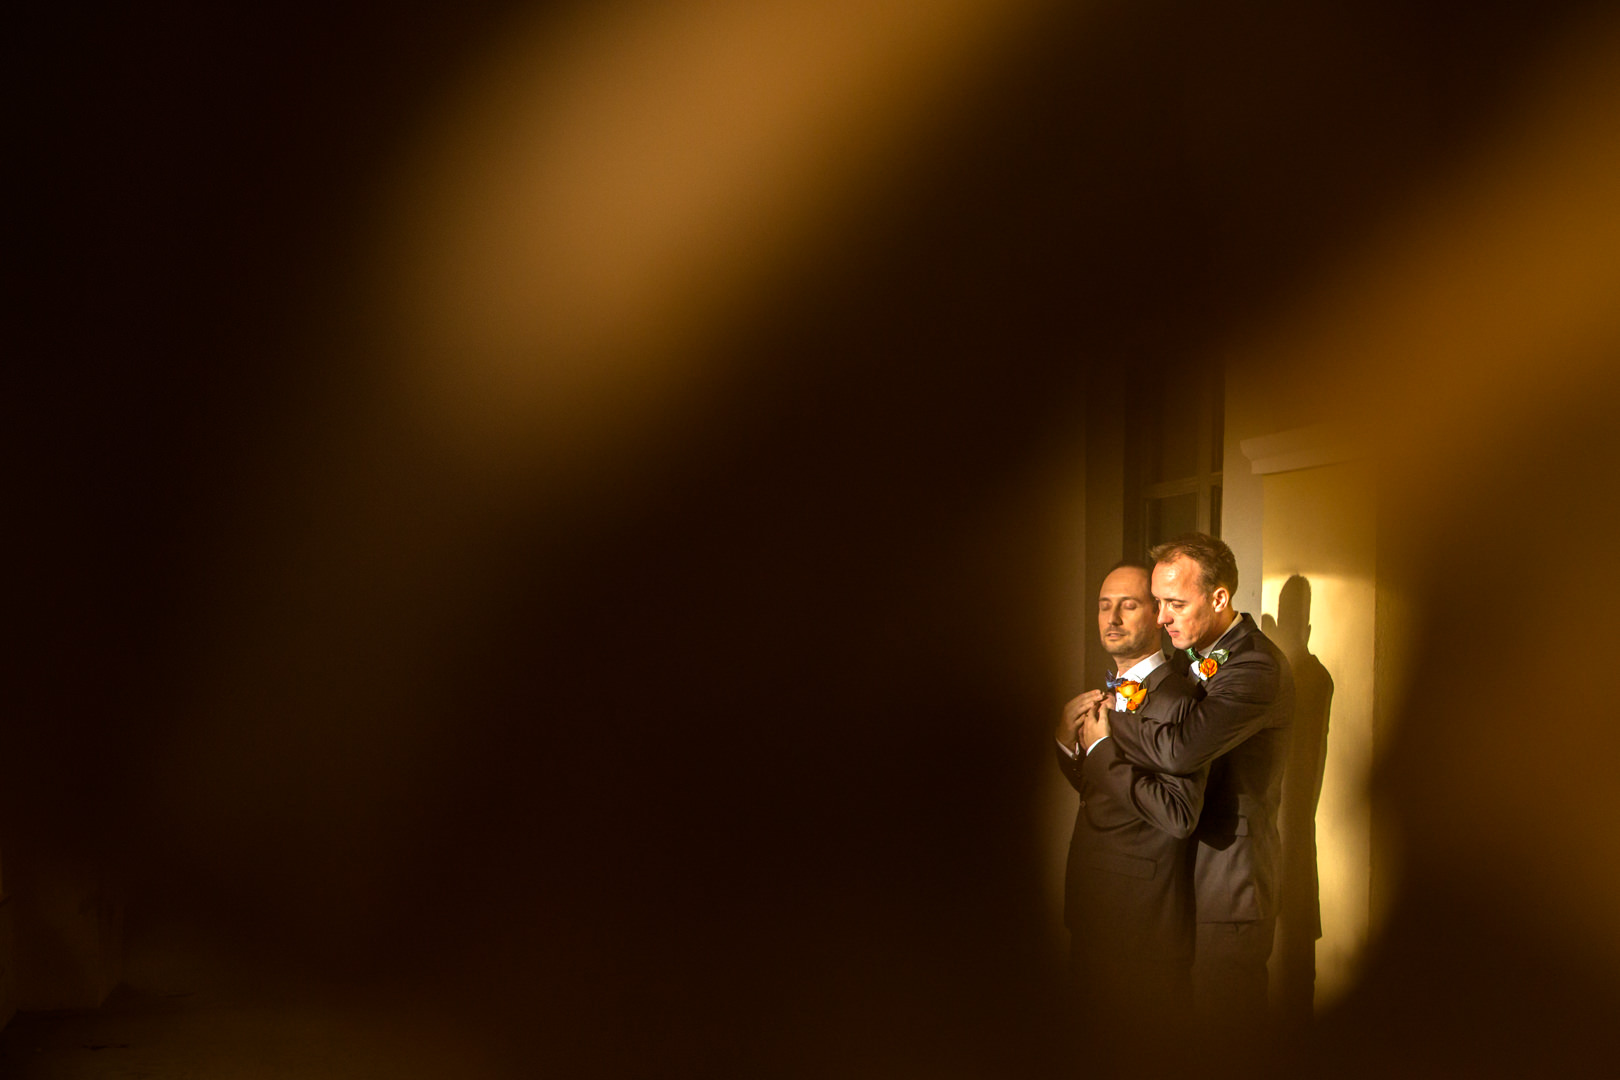 Same-sex-wedding-barcelona-boda- gay-samesex-engagement-Rafael-Torres-fotografo-bodas-sevilla-madrid-barcelona-wedding-photographer--28.jpg